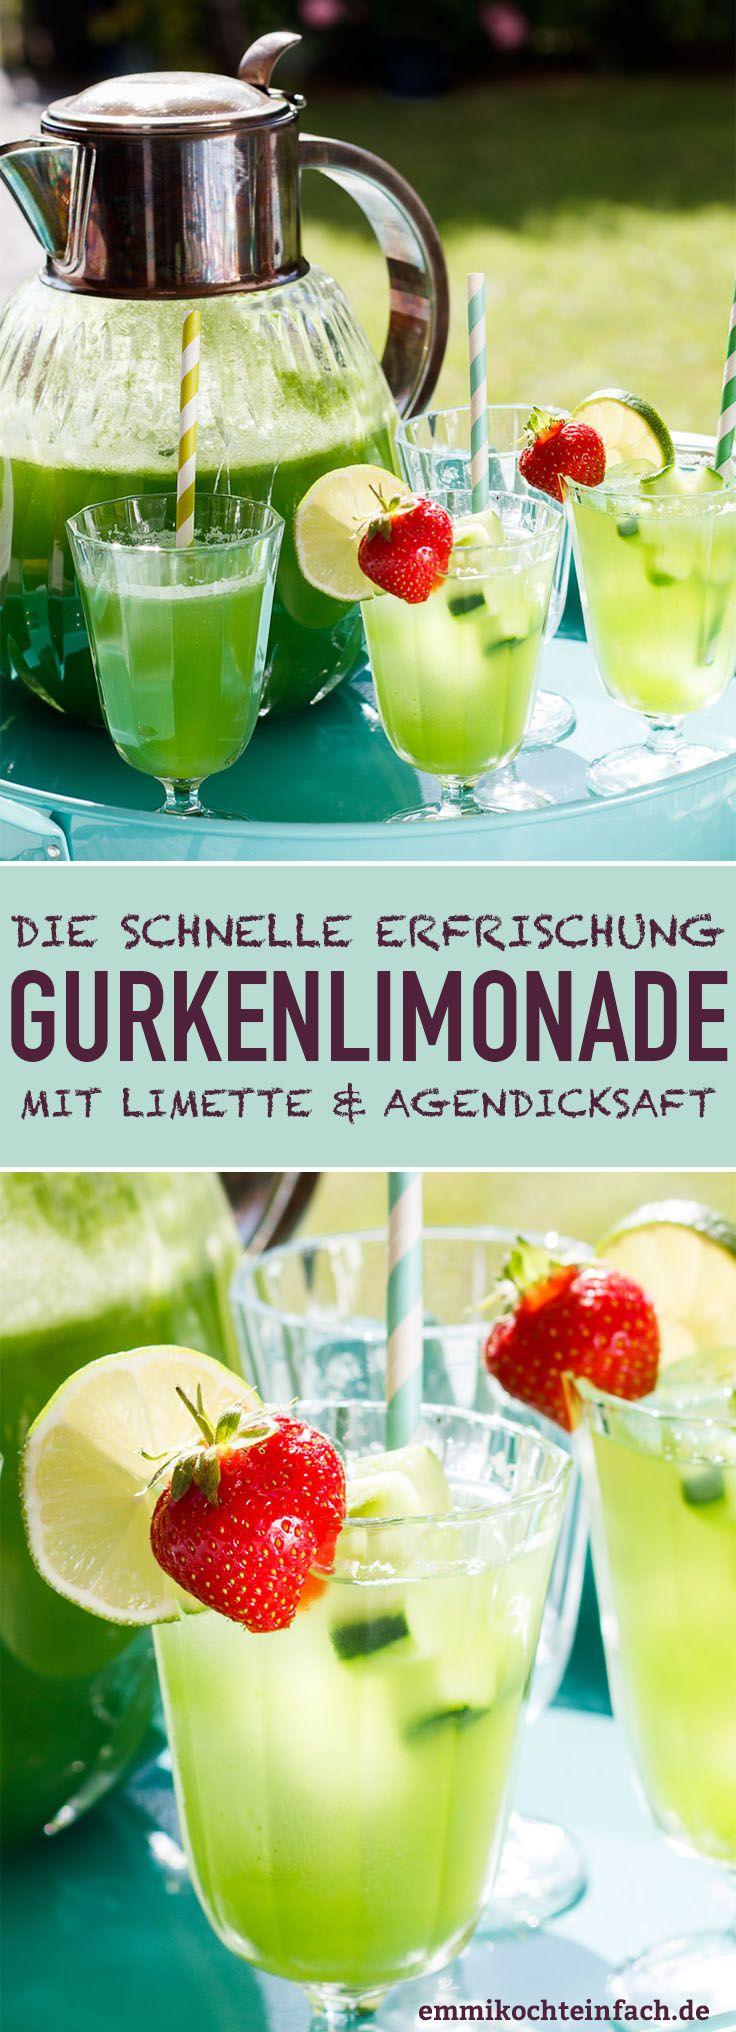 Gurkenlimonade mit Limette und Agavendicksaft #lemonade